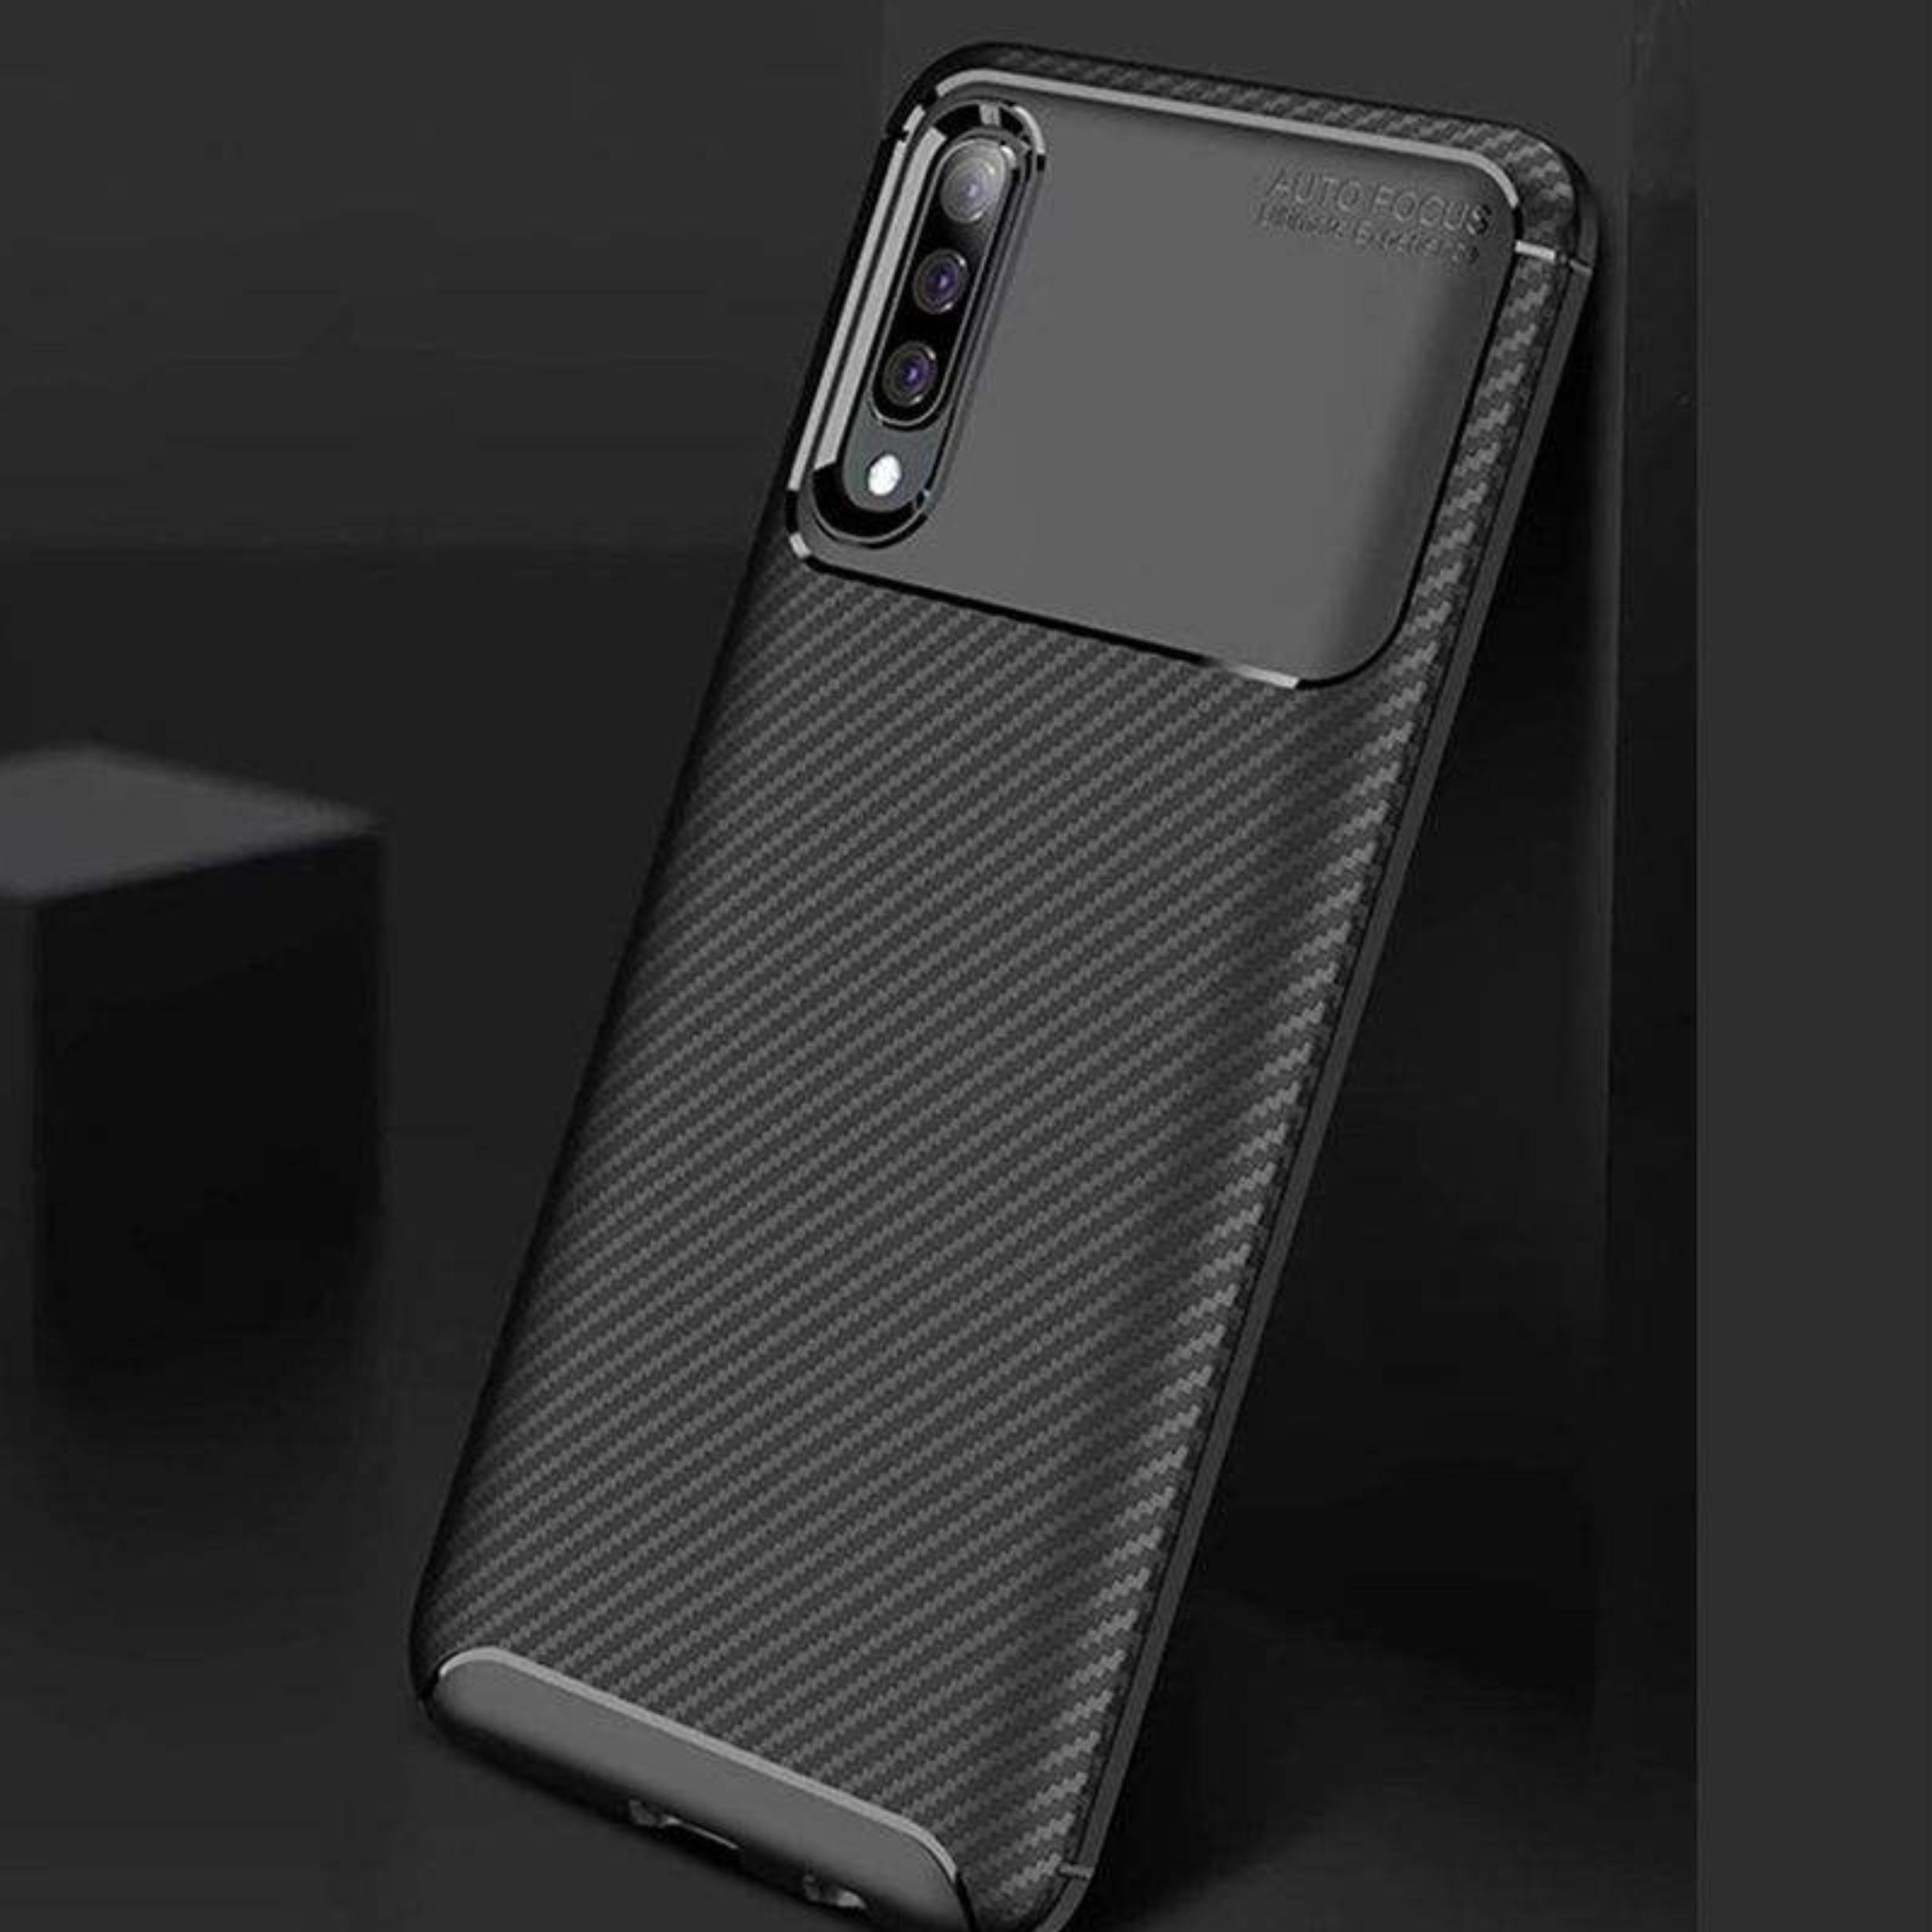 کاور لاین کینگ مدل A21 مناسب برای گوشی موبایل سامسونگ Galaxy A70/ A70S thumb 2 2